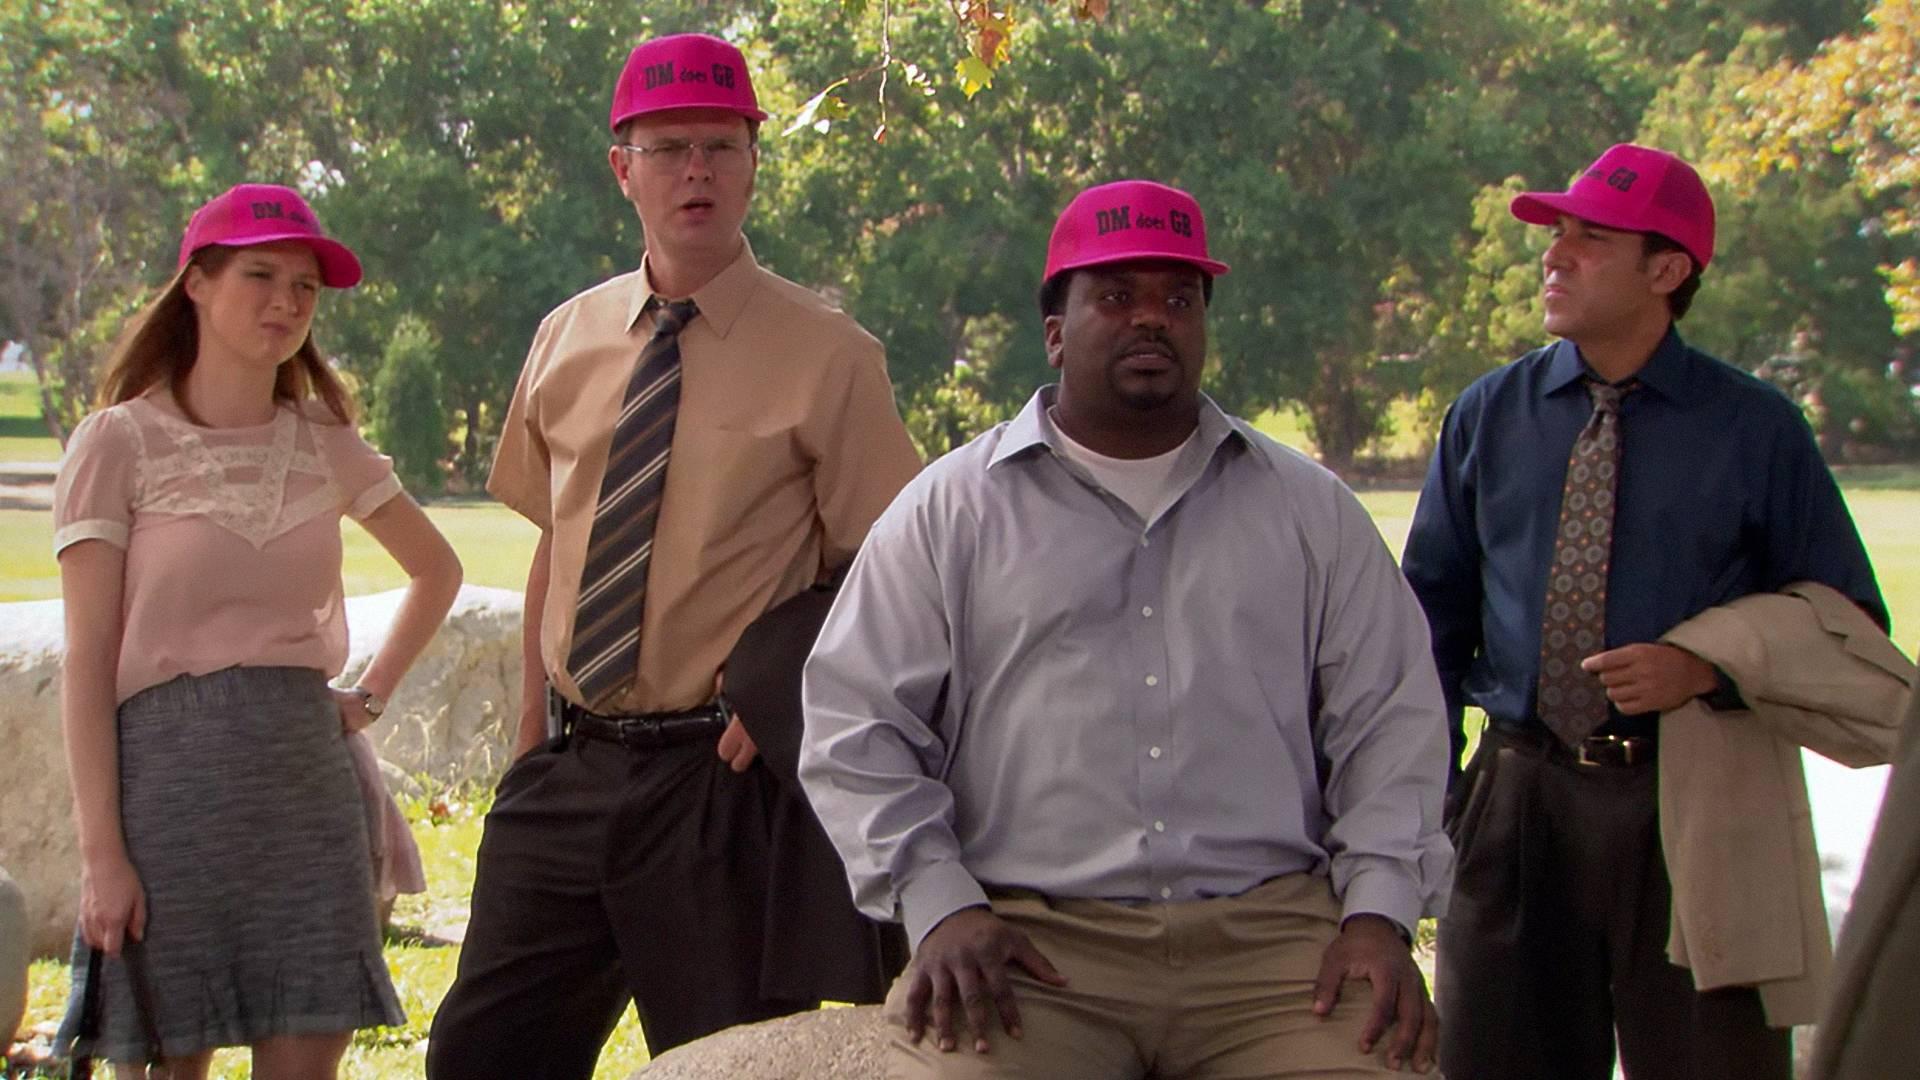 The Office Season 8 Episode 8